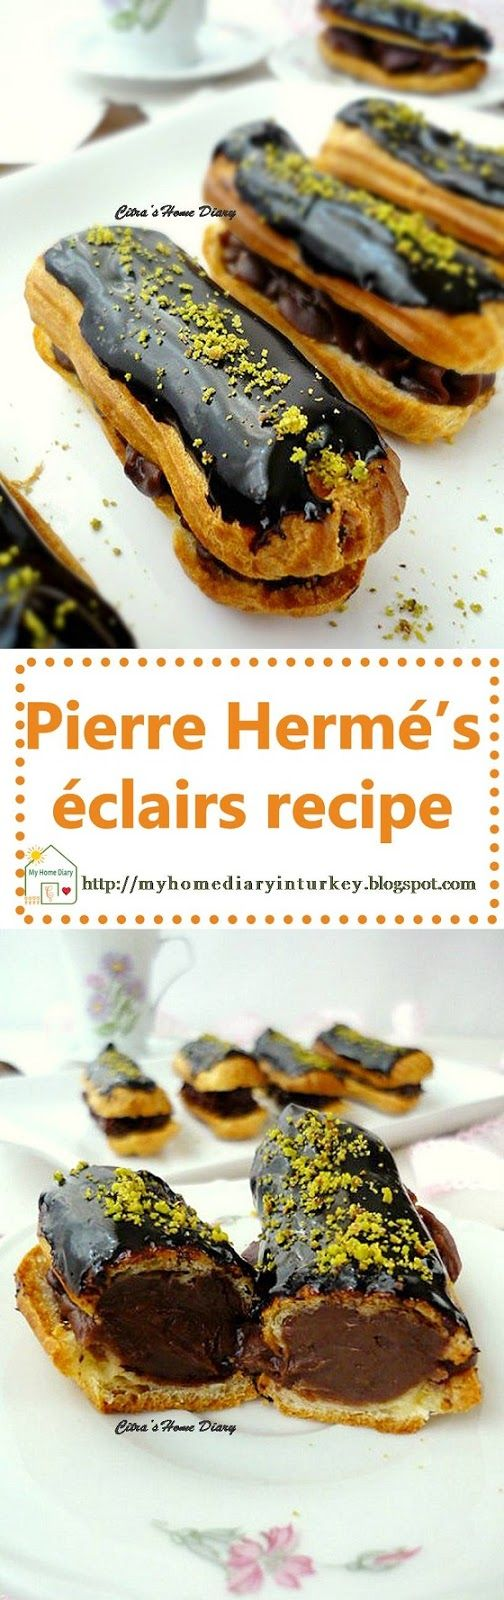 Pierre Hermé's éclairs recipe.